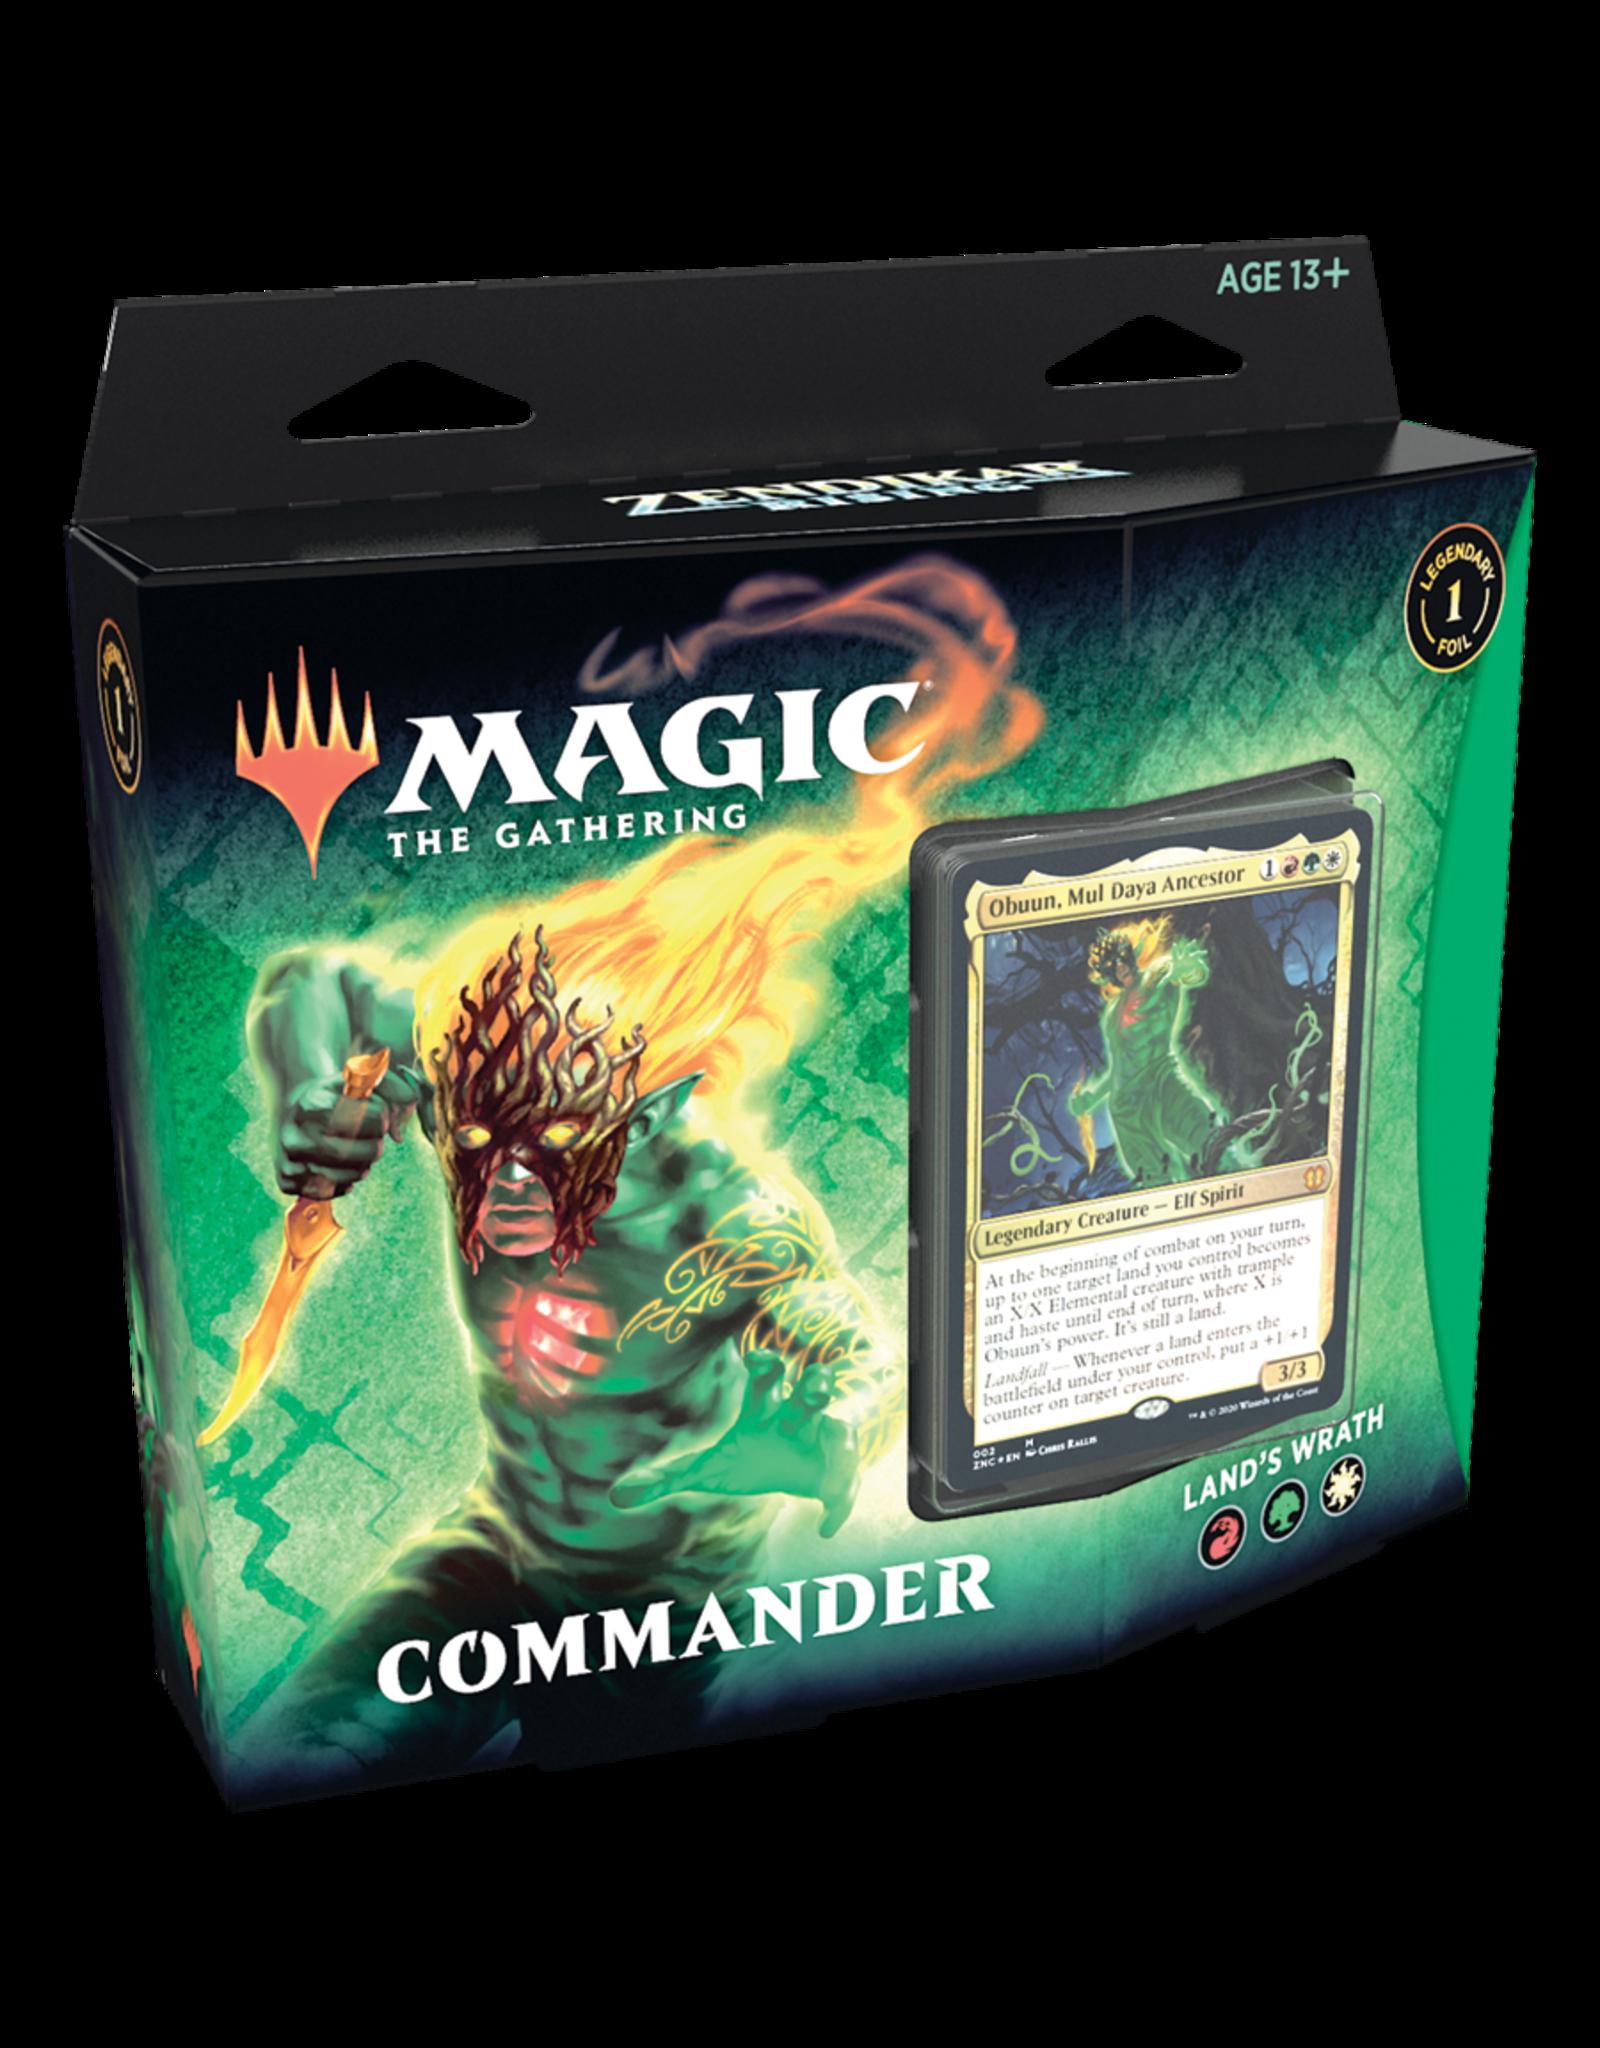 Wizards of the Coast MTG ZENDIKAR RISING - Commander Land's Wrath